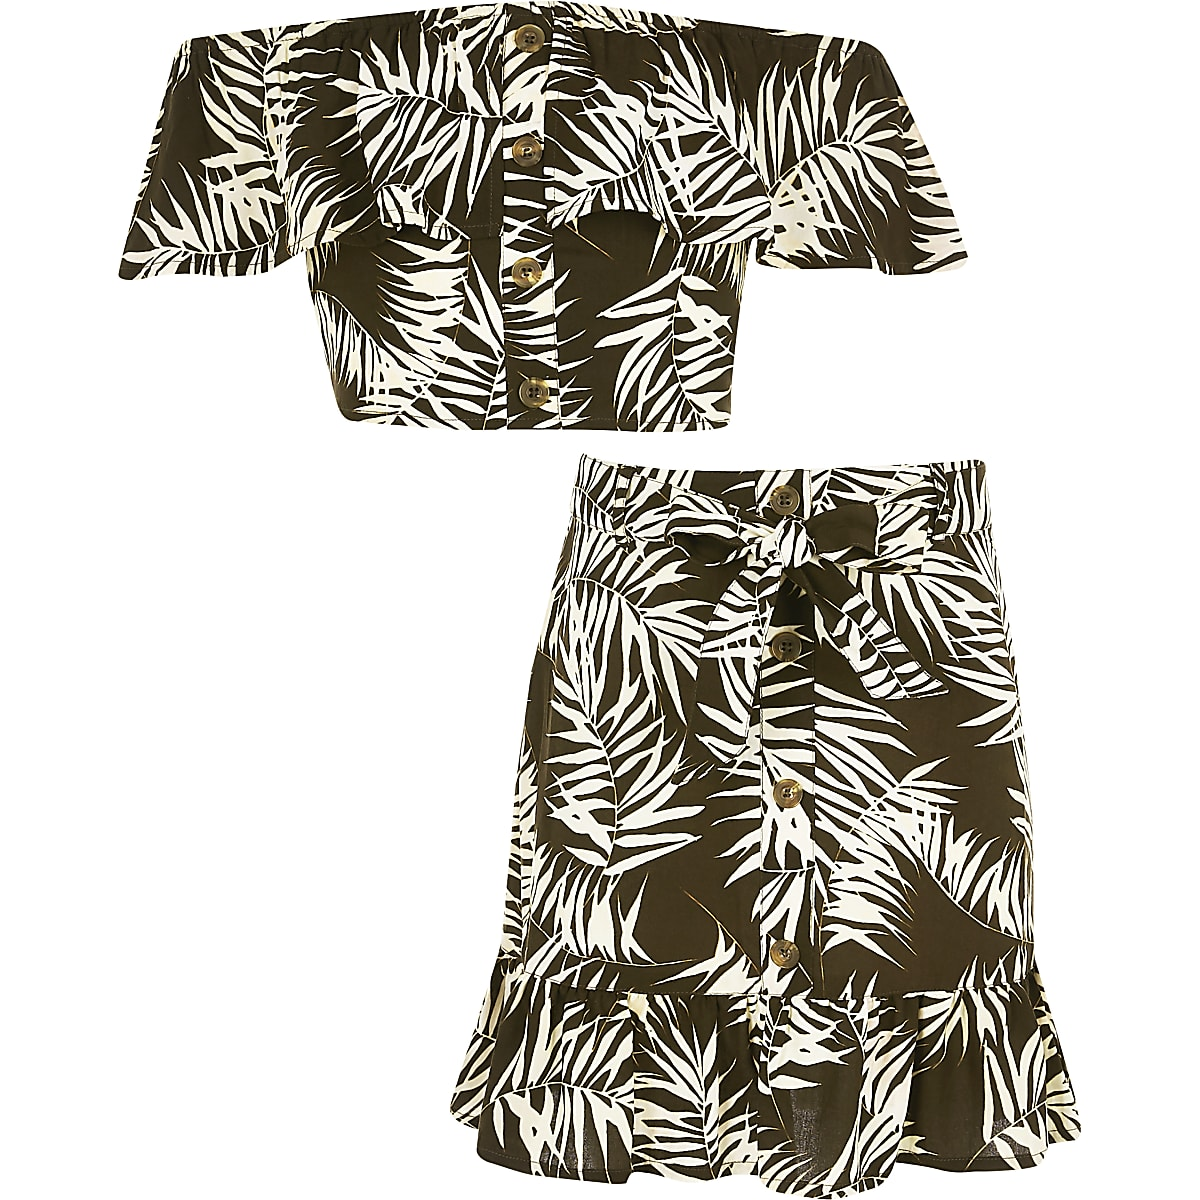 Girls brown palm print bardot top outfit